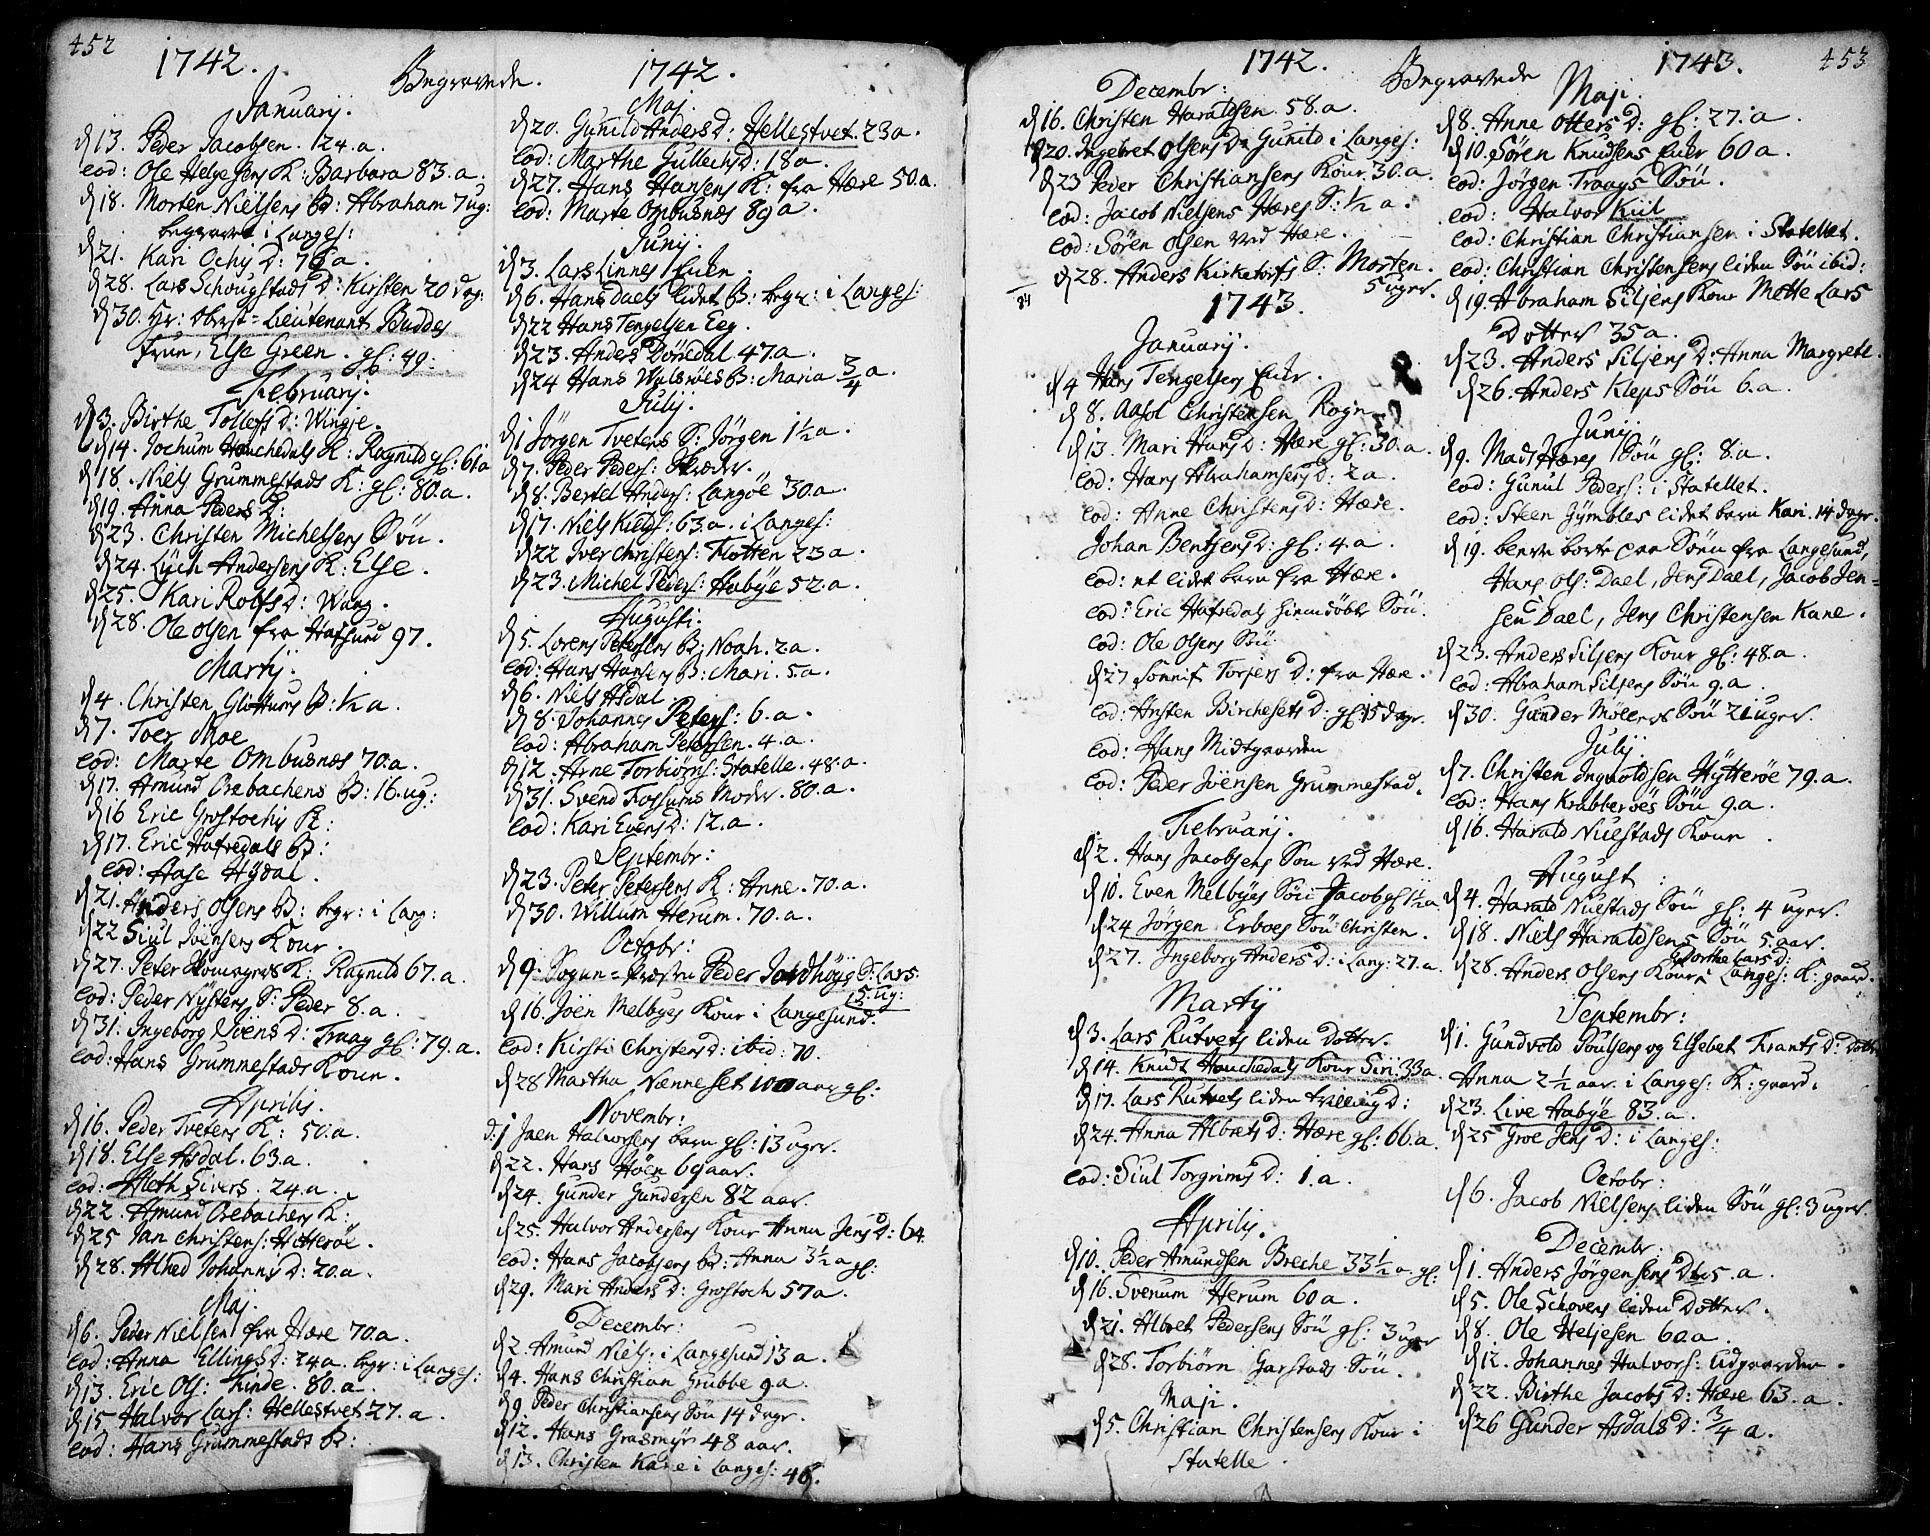 SAKO, Bamble kirkebøker, F/Fa/L0001: Ministerialbok nr. I 1, 1702-1774, s. 452-453